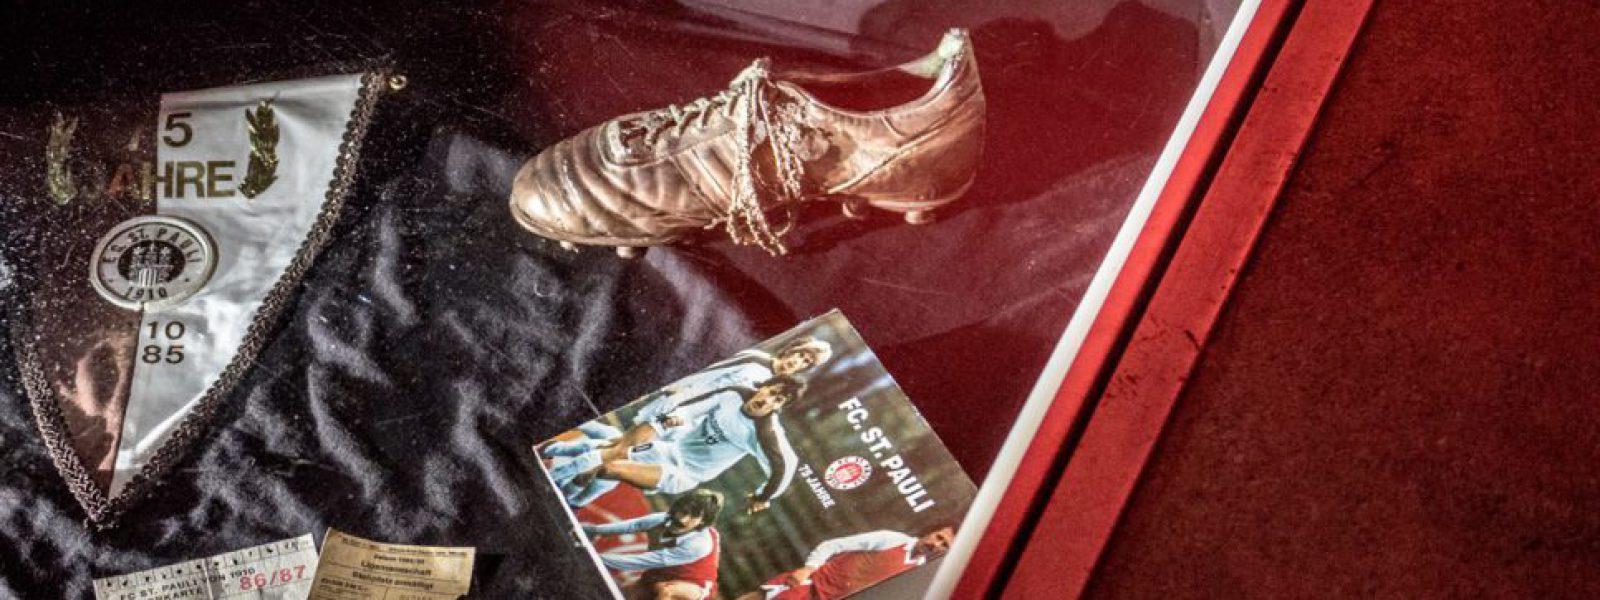 Eroeffnung FC St Pauli Museum (Foto Sabrina Adeline Nagel) - 24